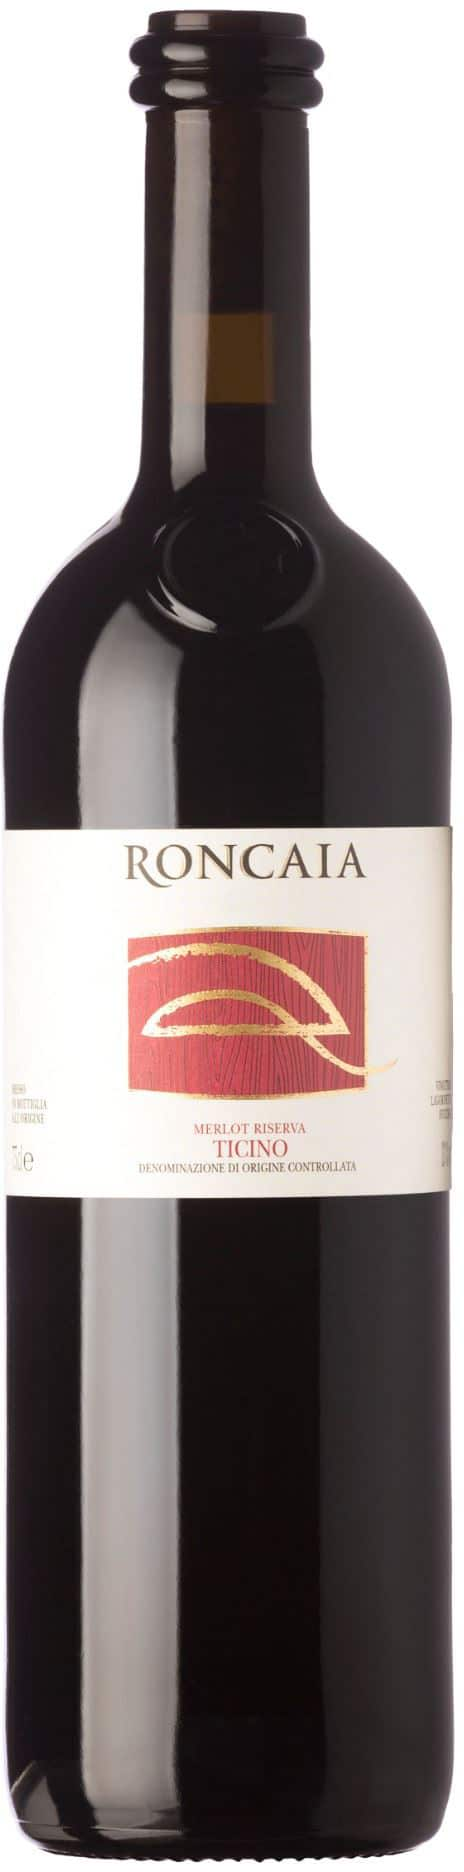 Roncaia Riserva